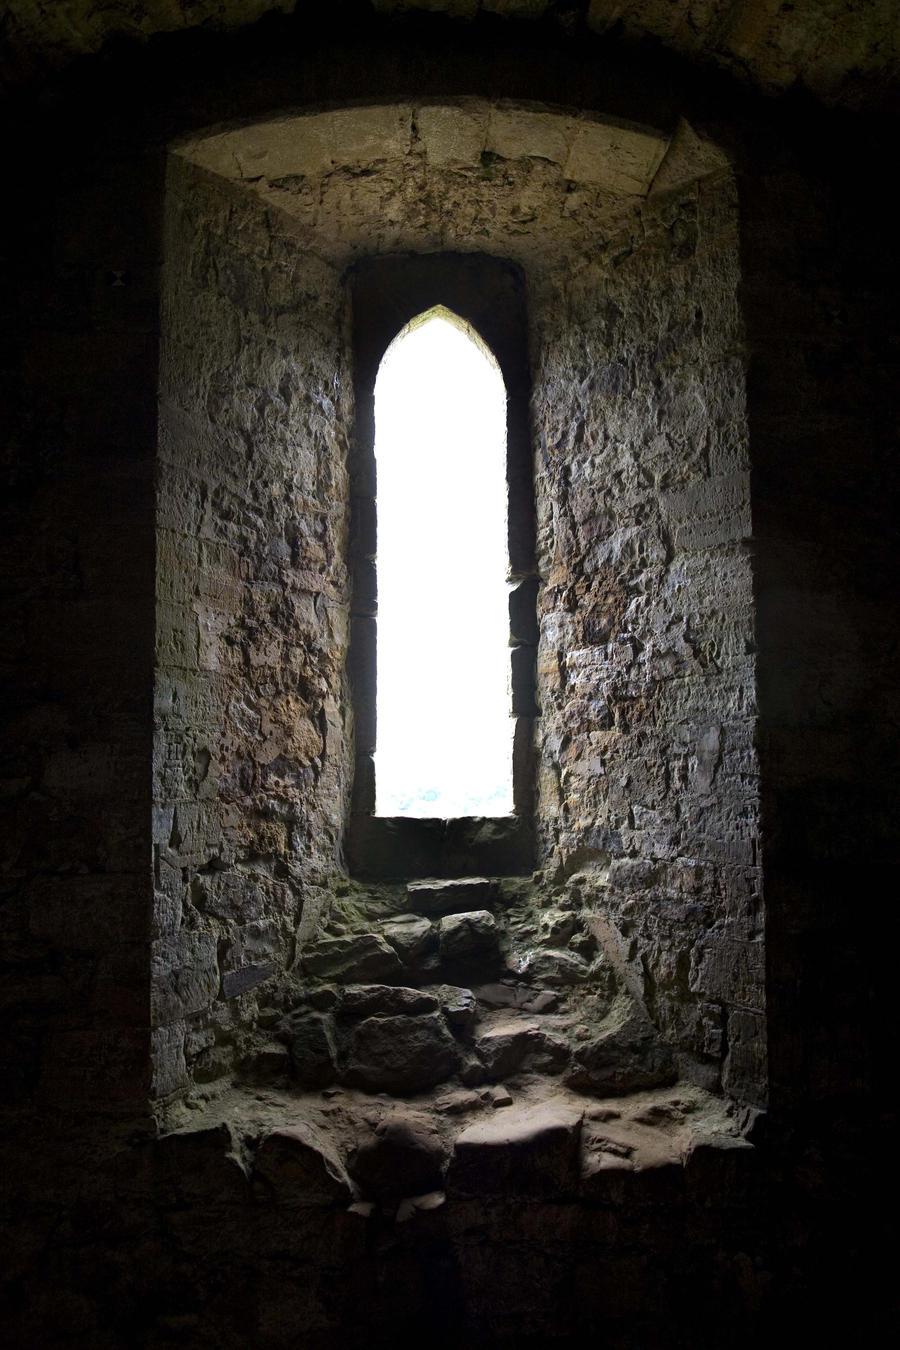 Window Seat - Castle Ruins by NickiStock